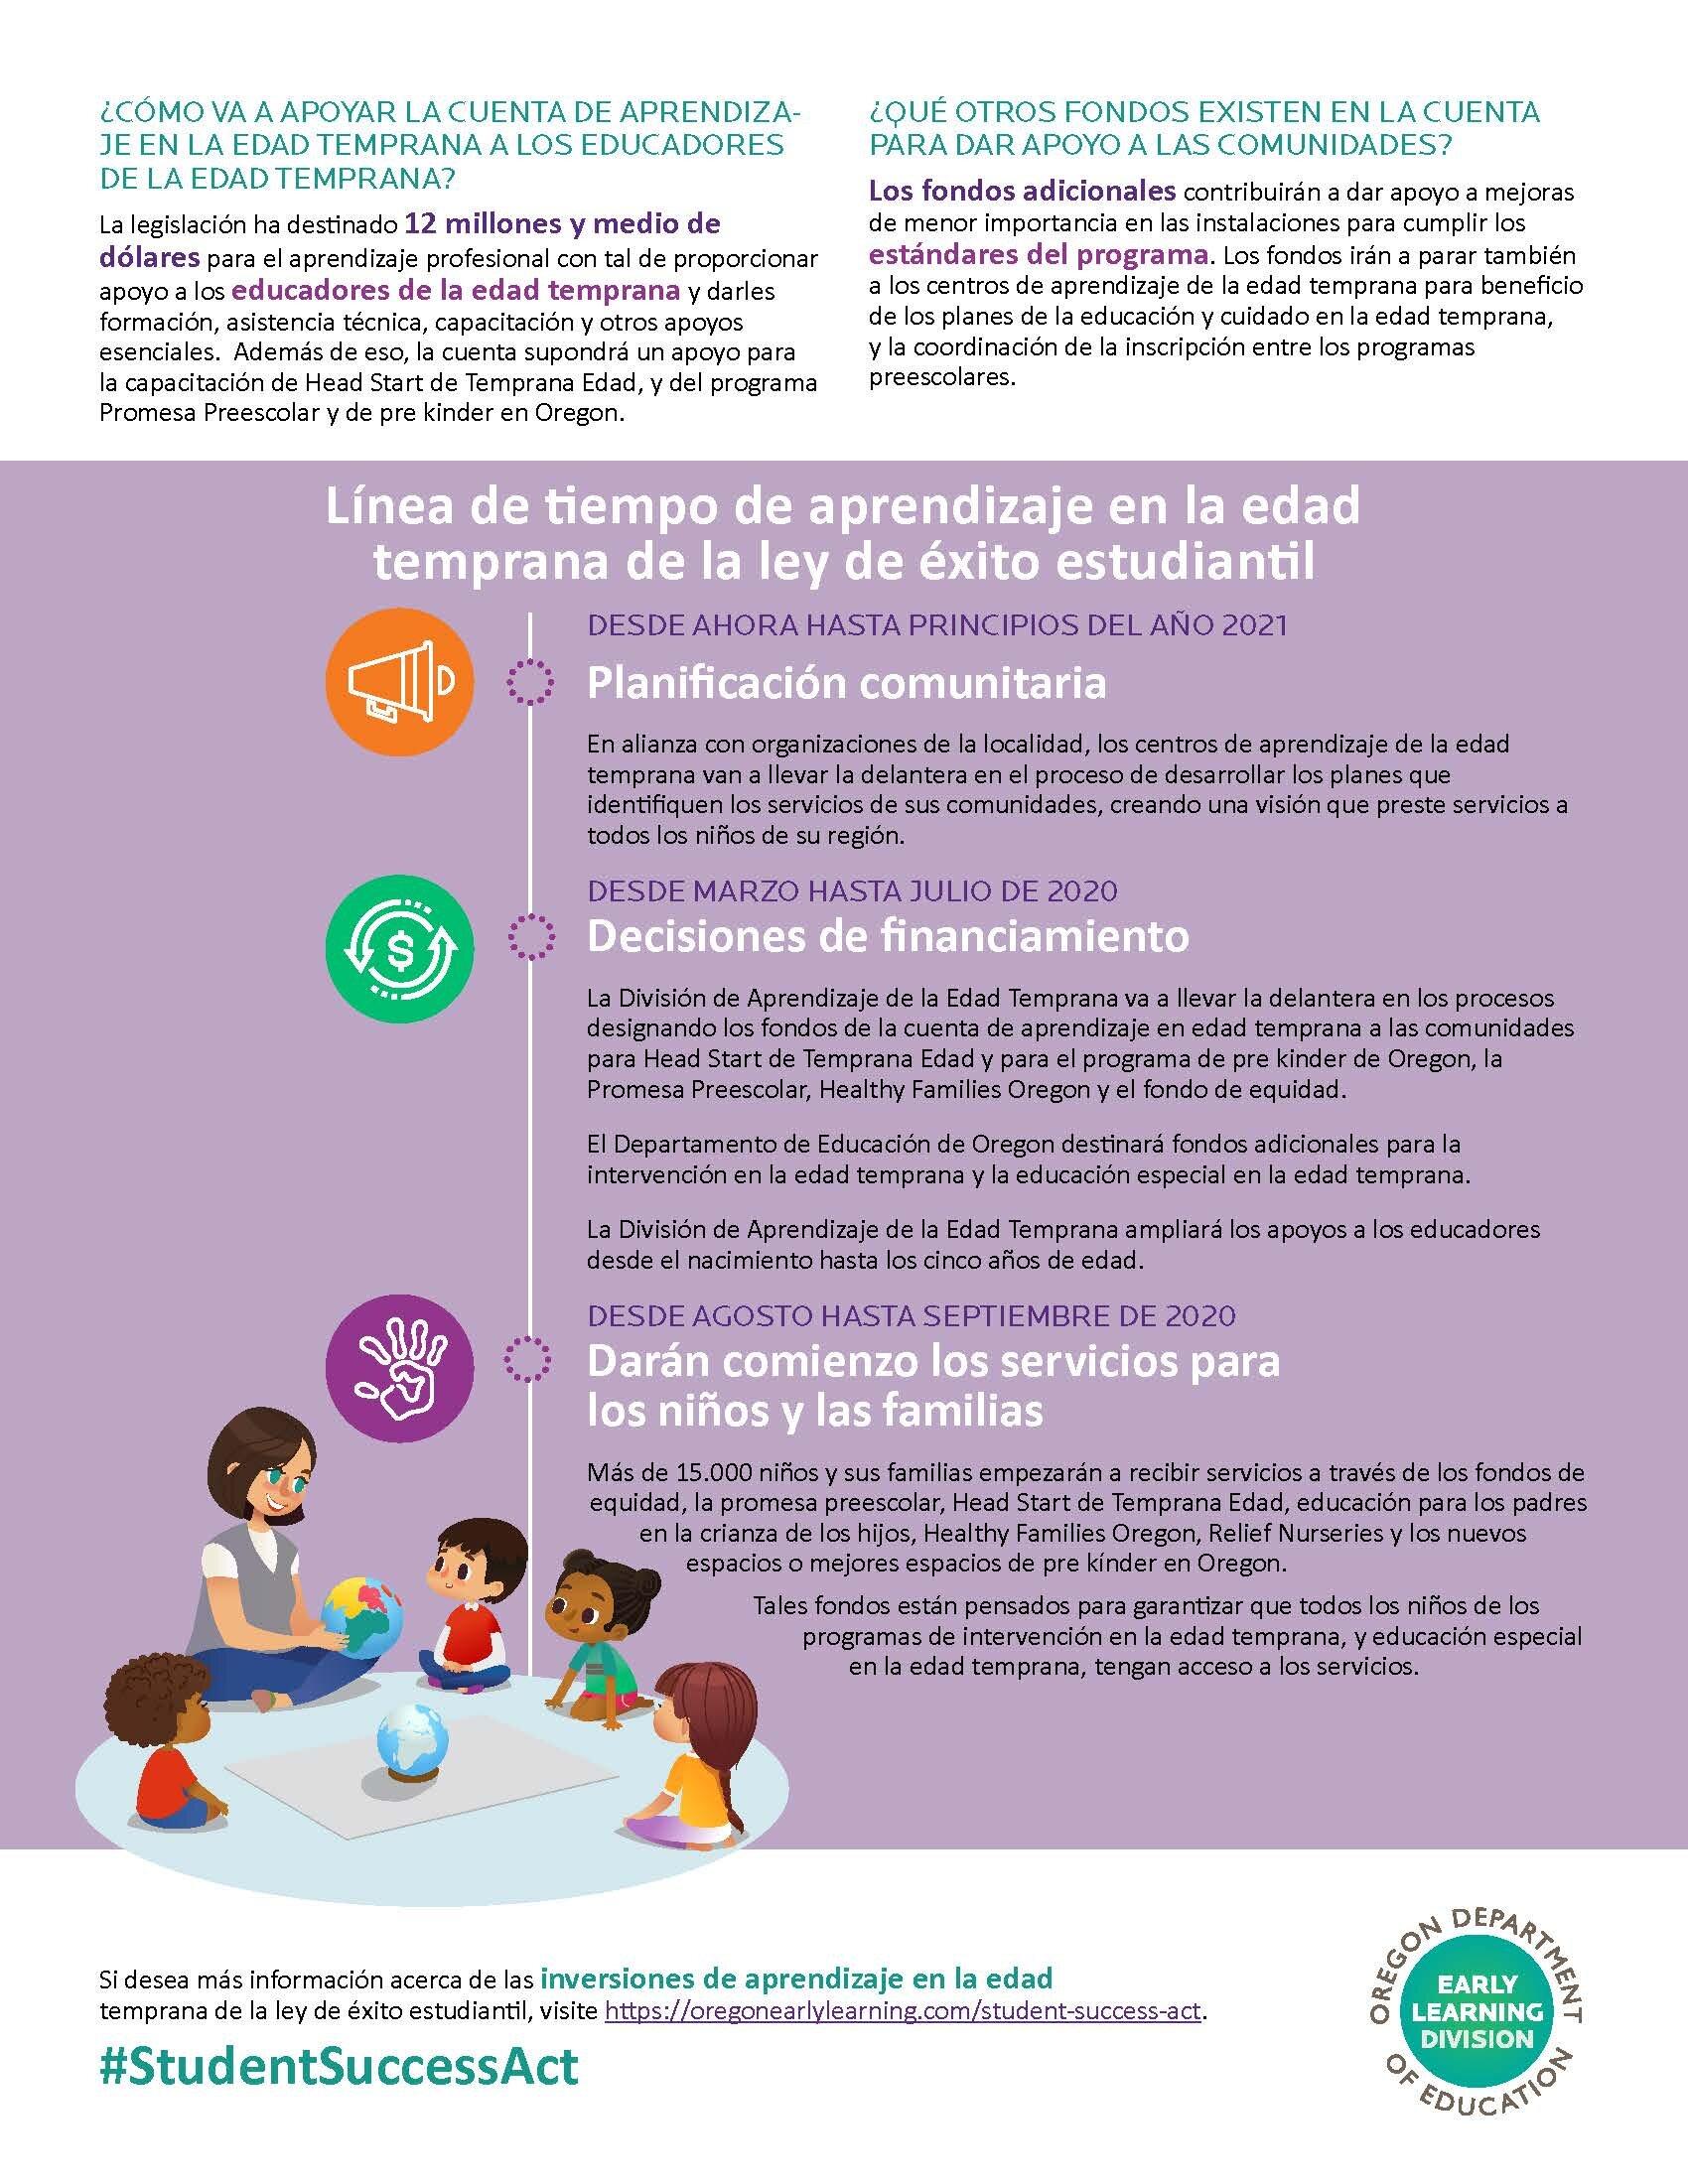 59172_ODE_ELD_SSA Infographic SPANISH_2019 v2 copy_Page_2.jpg